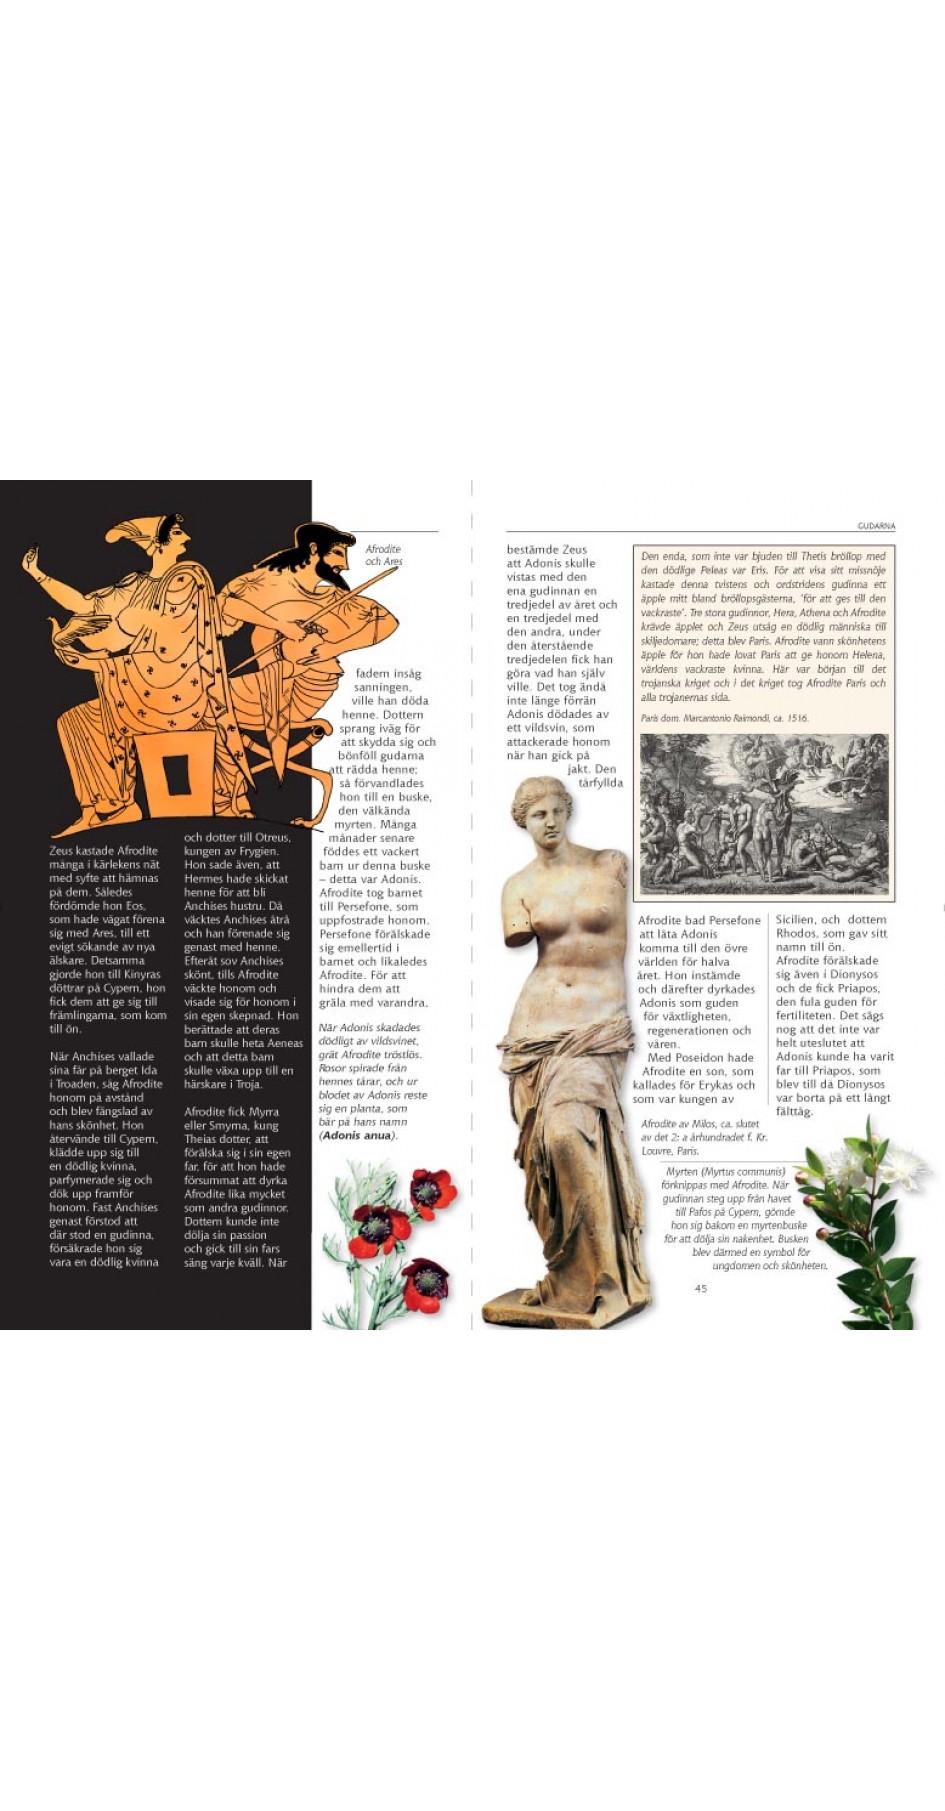 Grekisk Mytologi